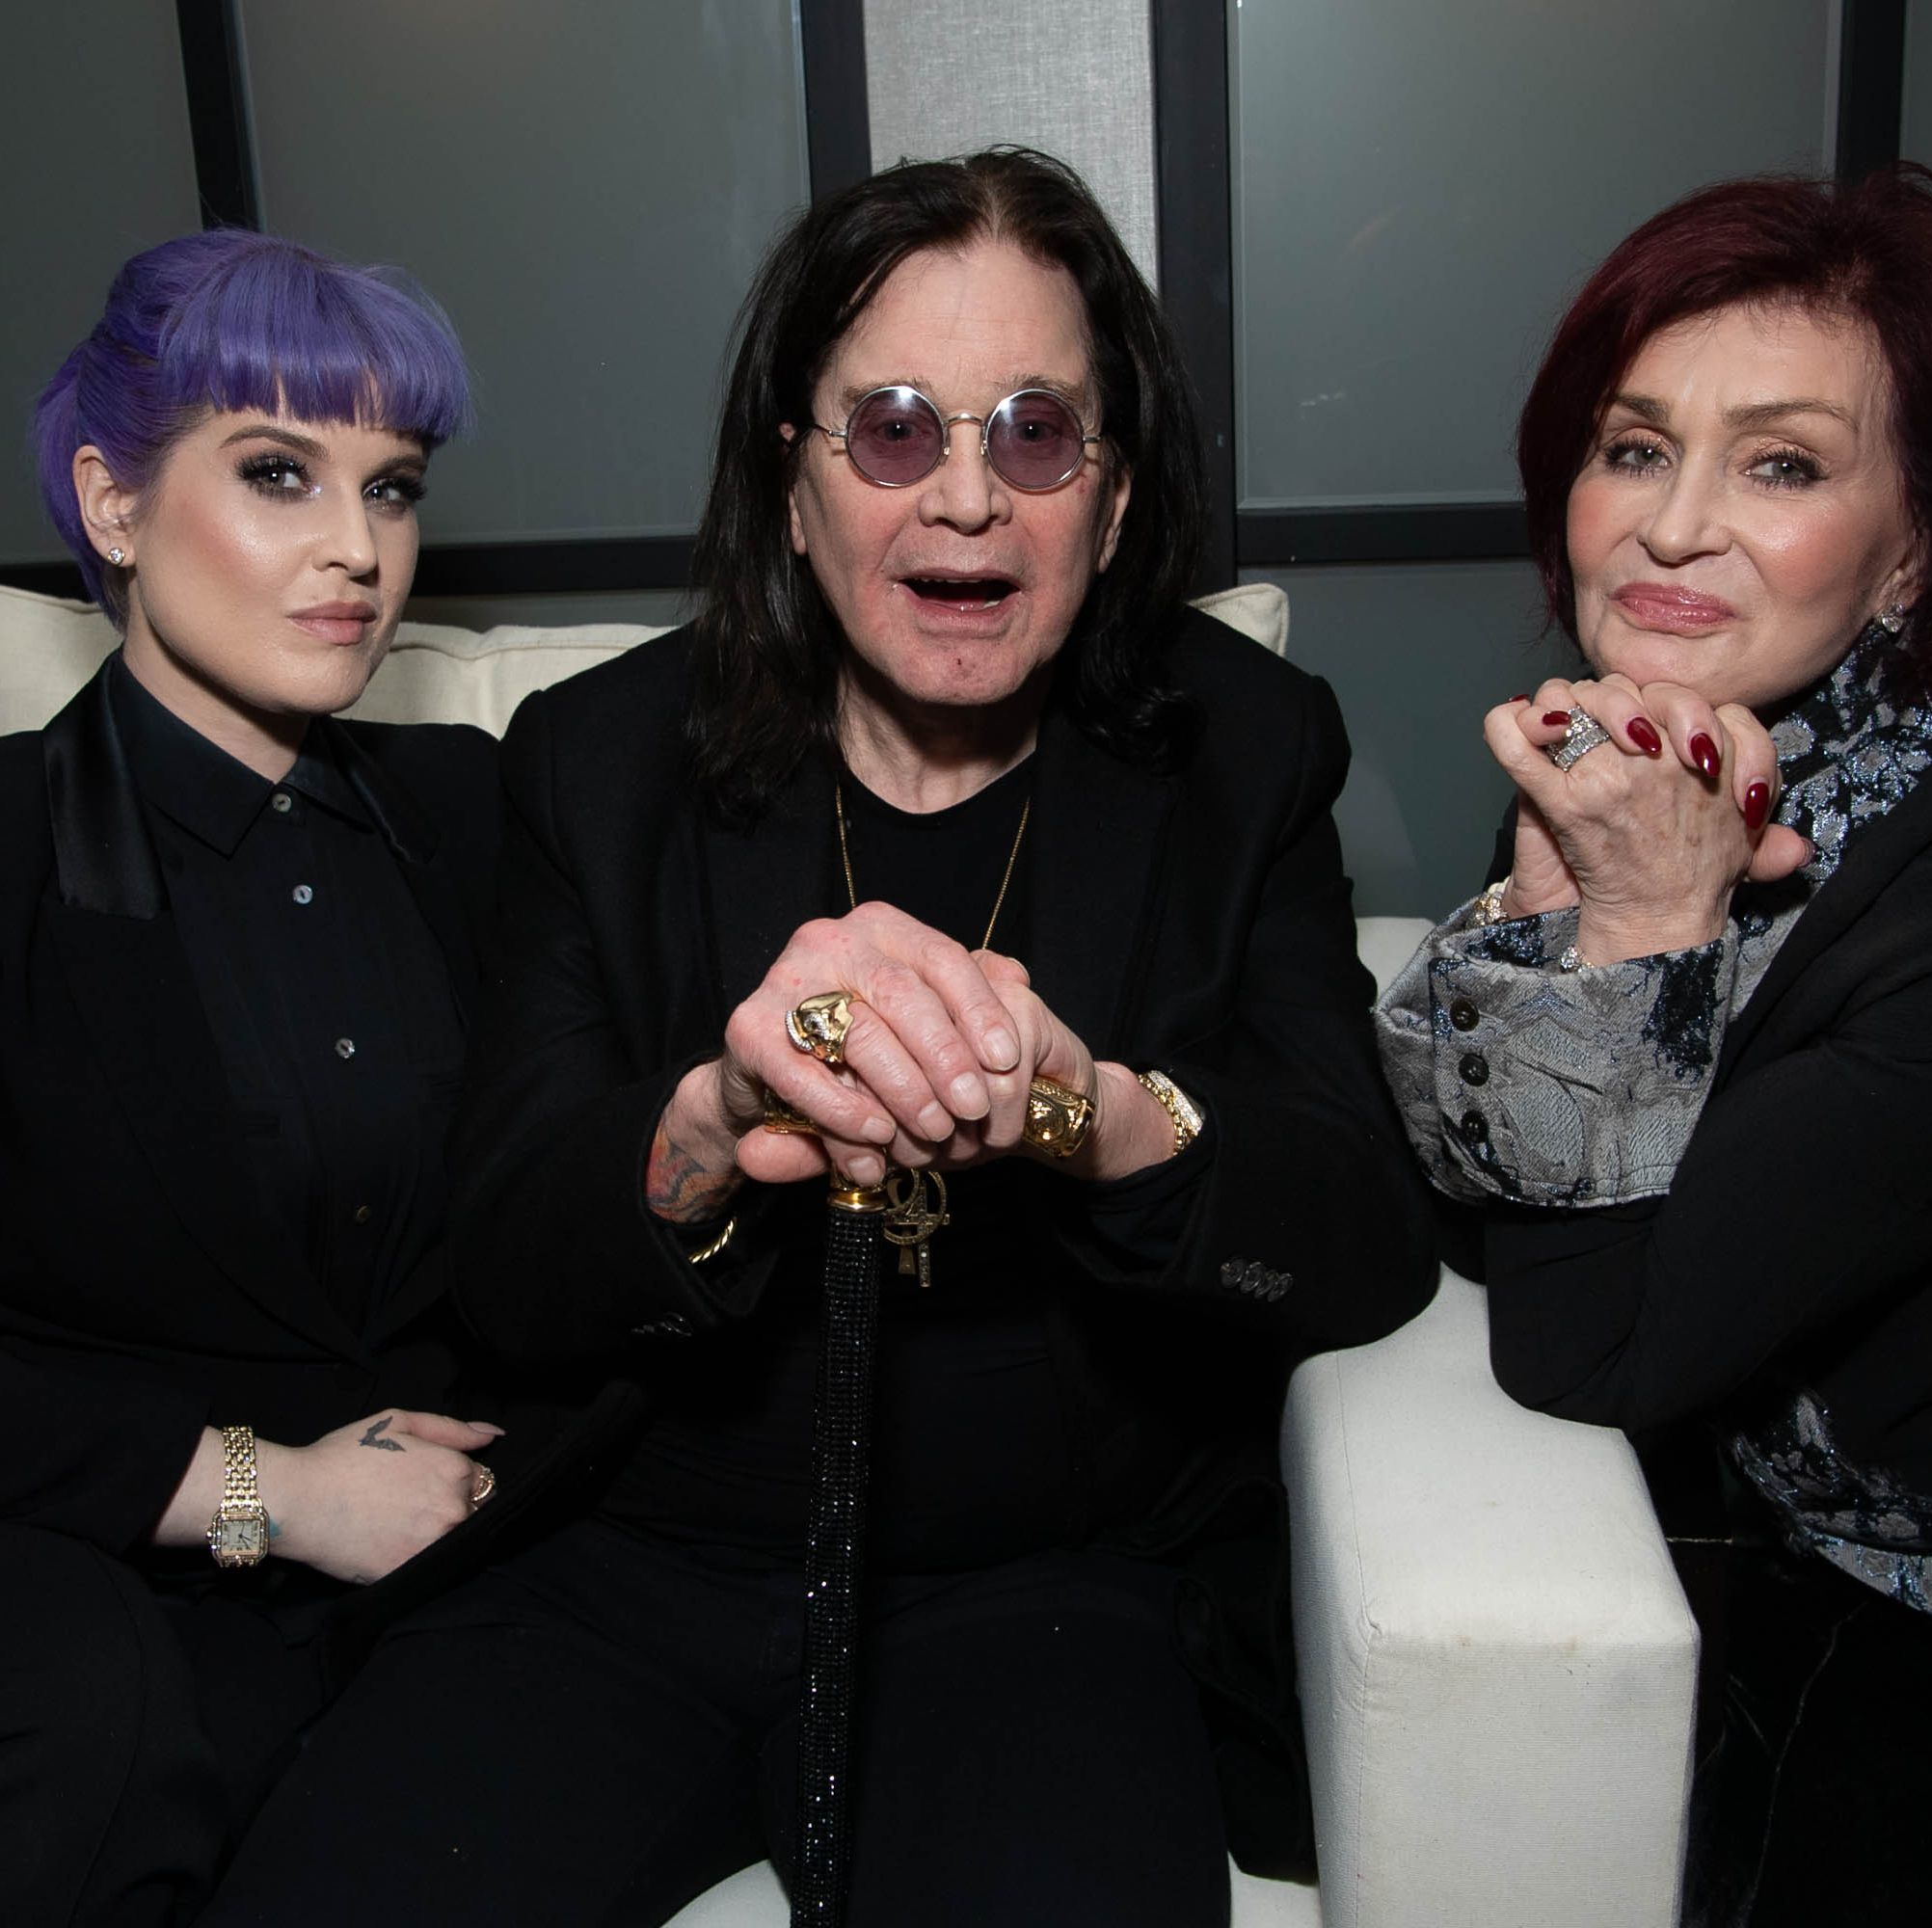 Ozzy Osbourne Reveals He's Battling Parkinson's Disease in